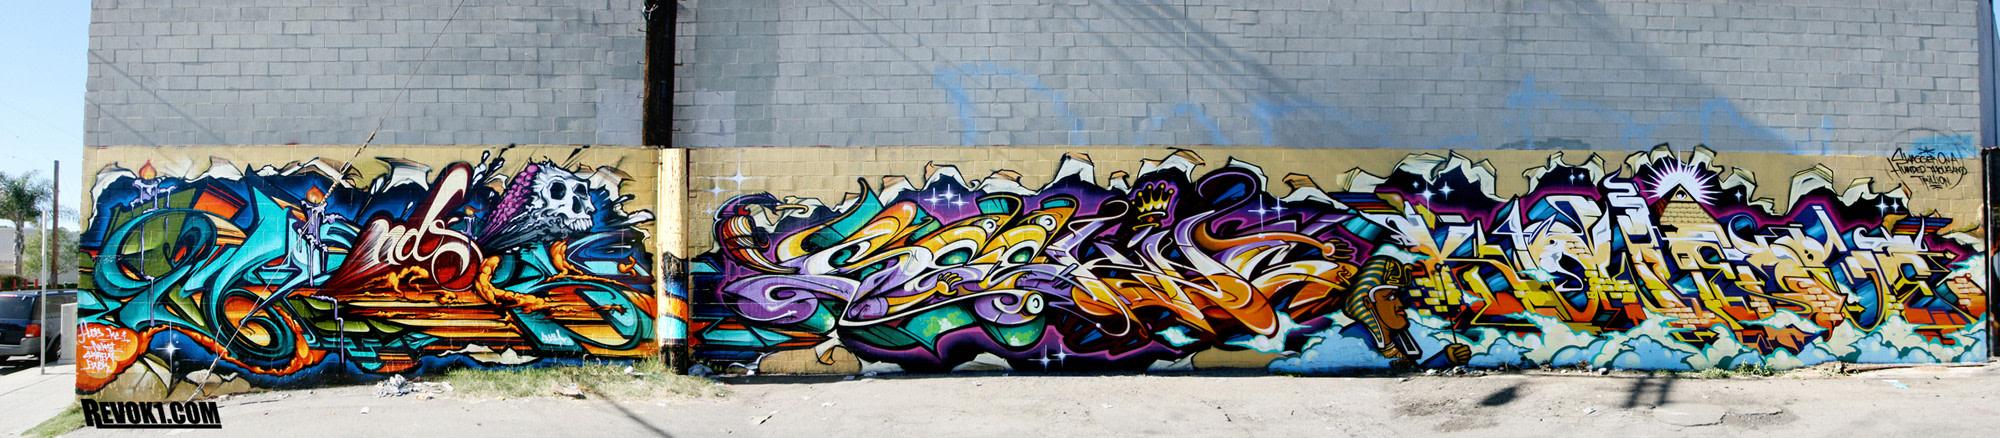 Artwork By Rime, Revok, Pose in Los Angeles